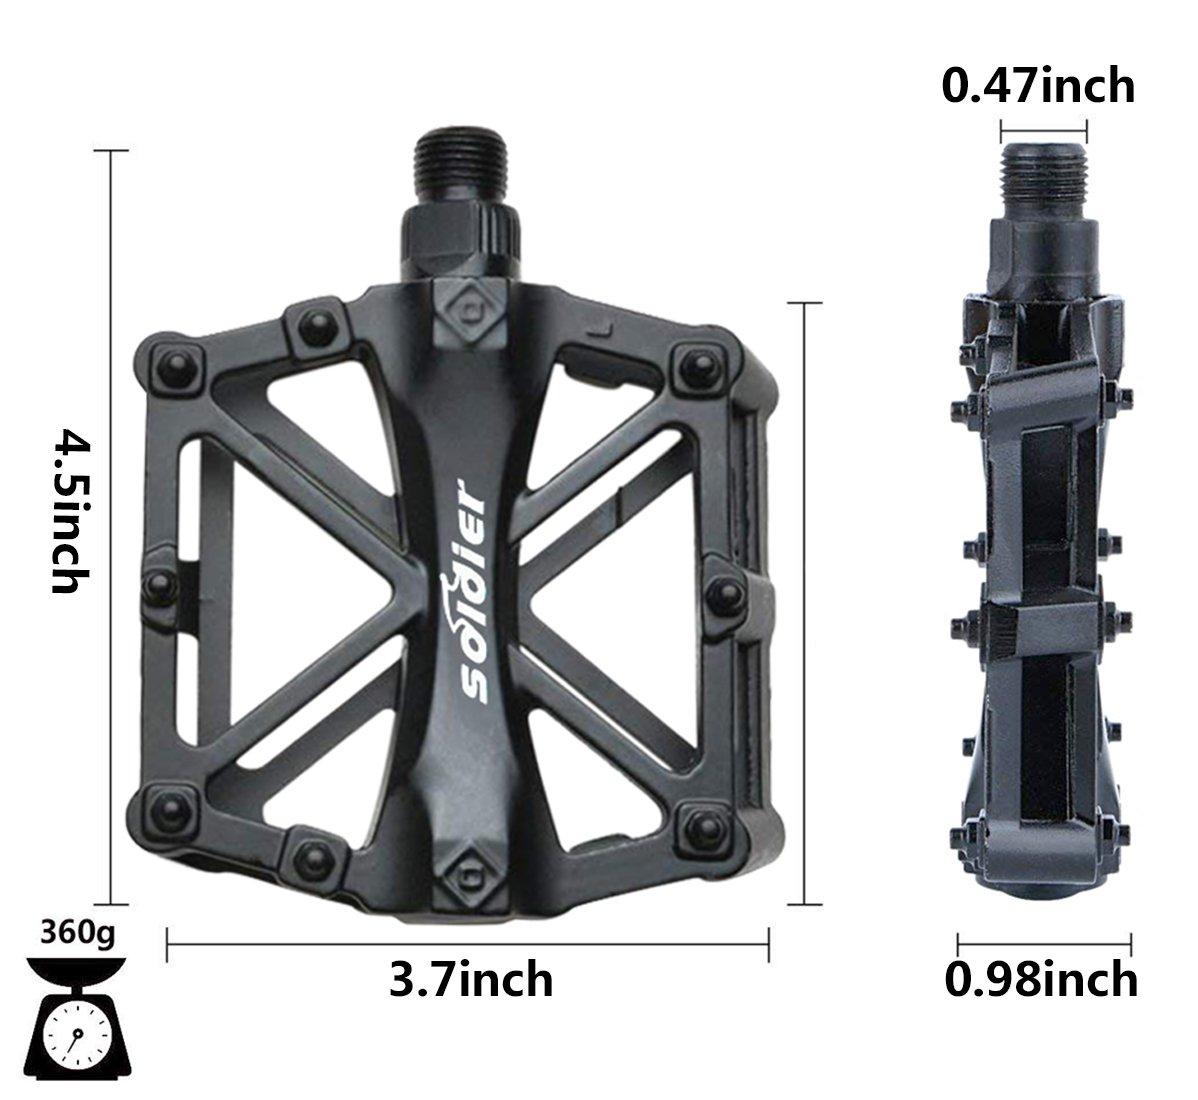 Pedales Bicicleta, Pedals Impermeable 9/16 Pulgadas con Sellado ...